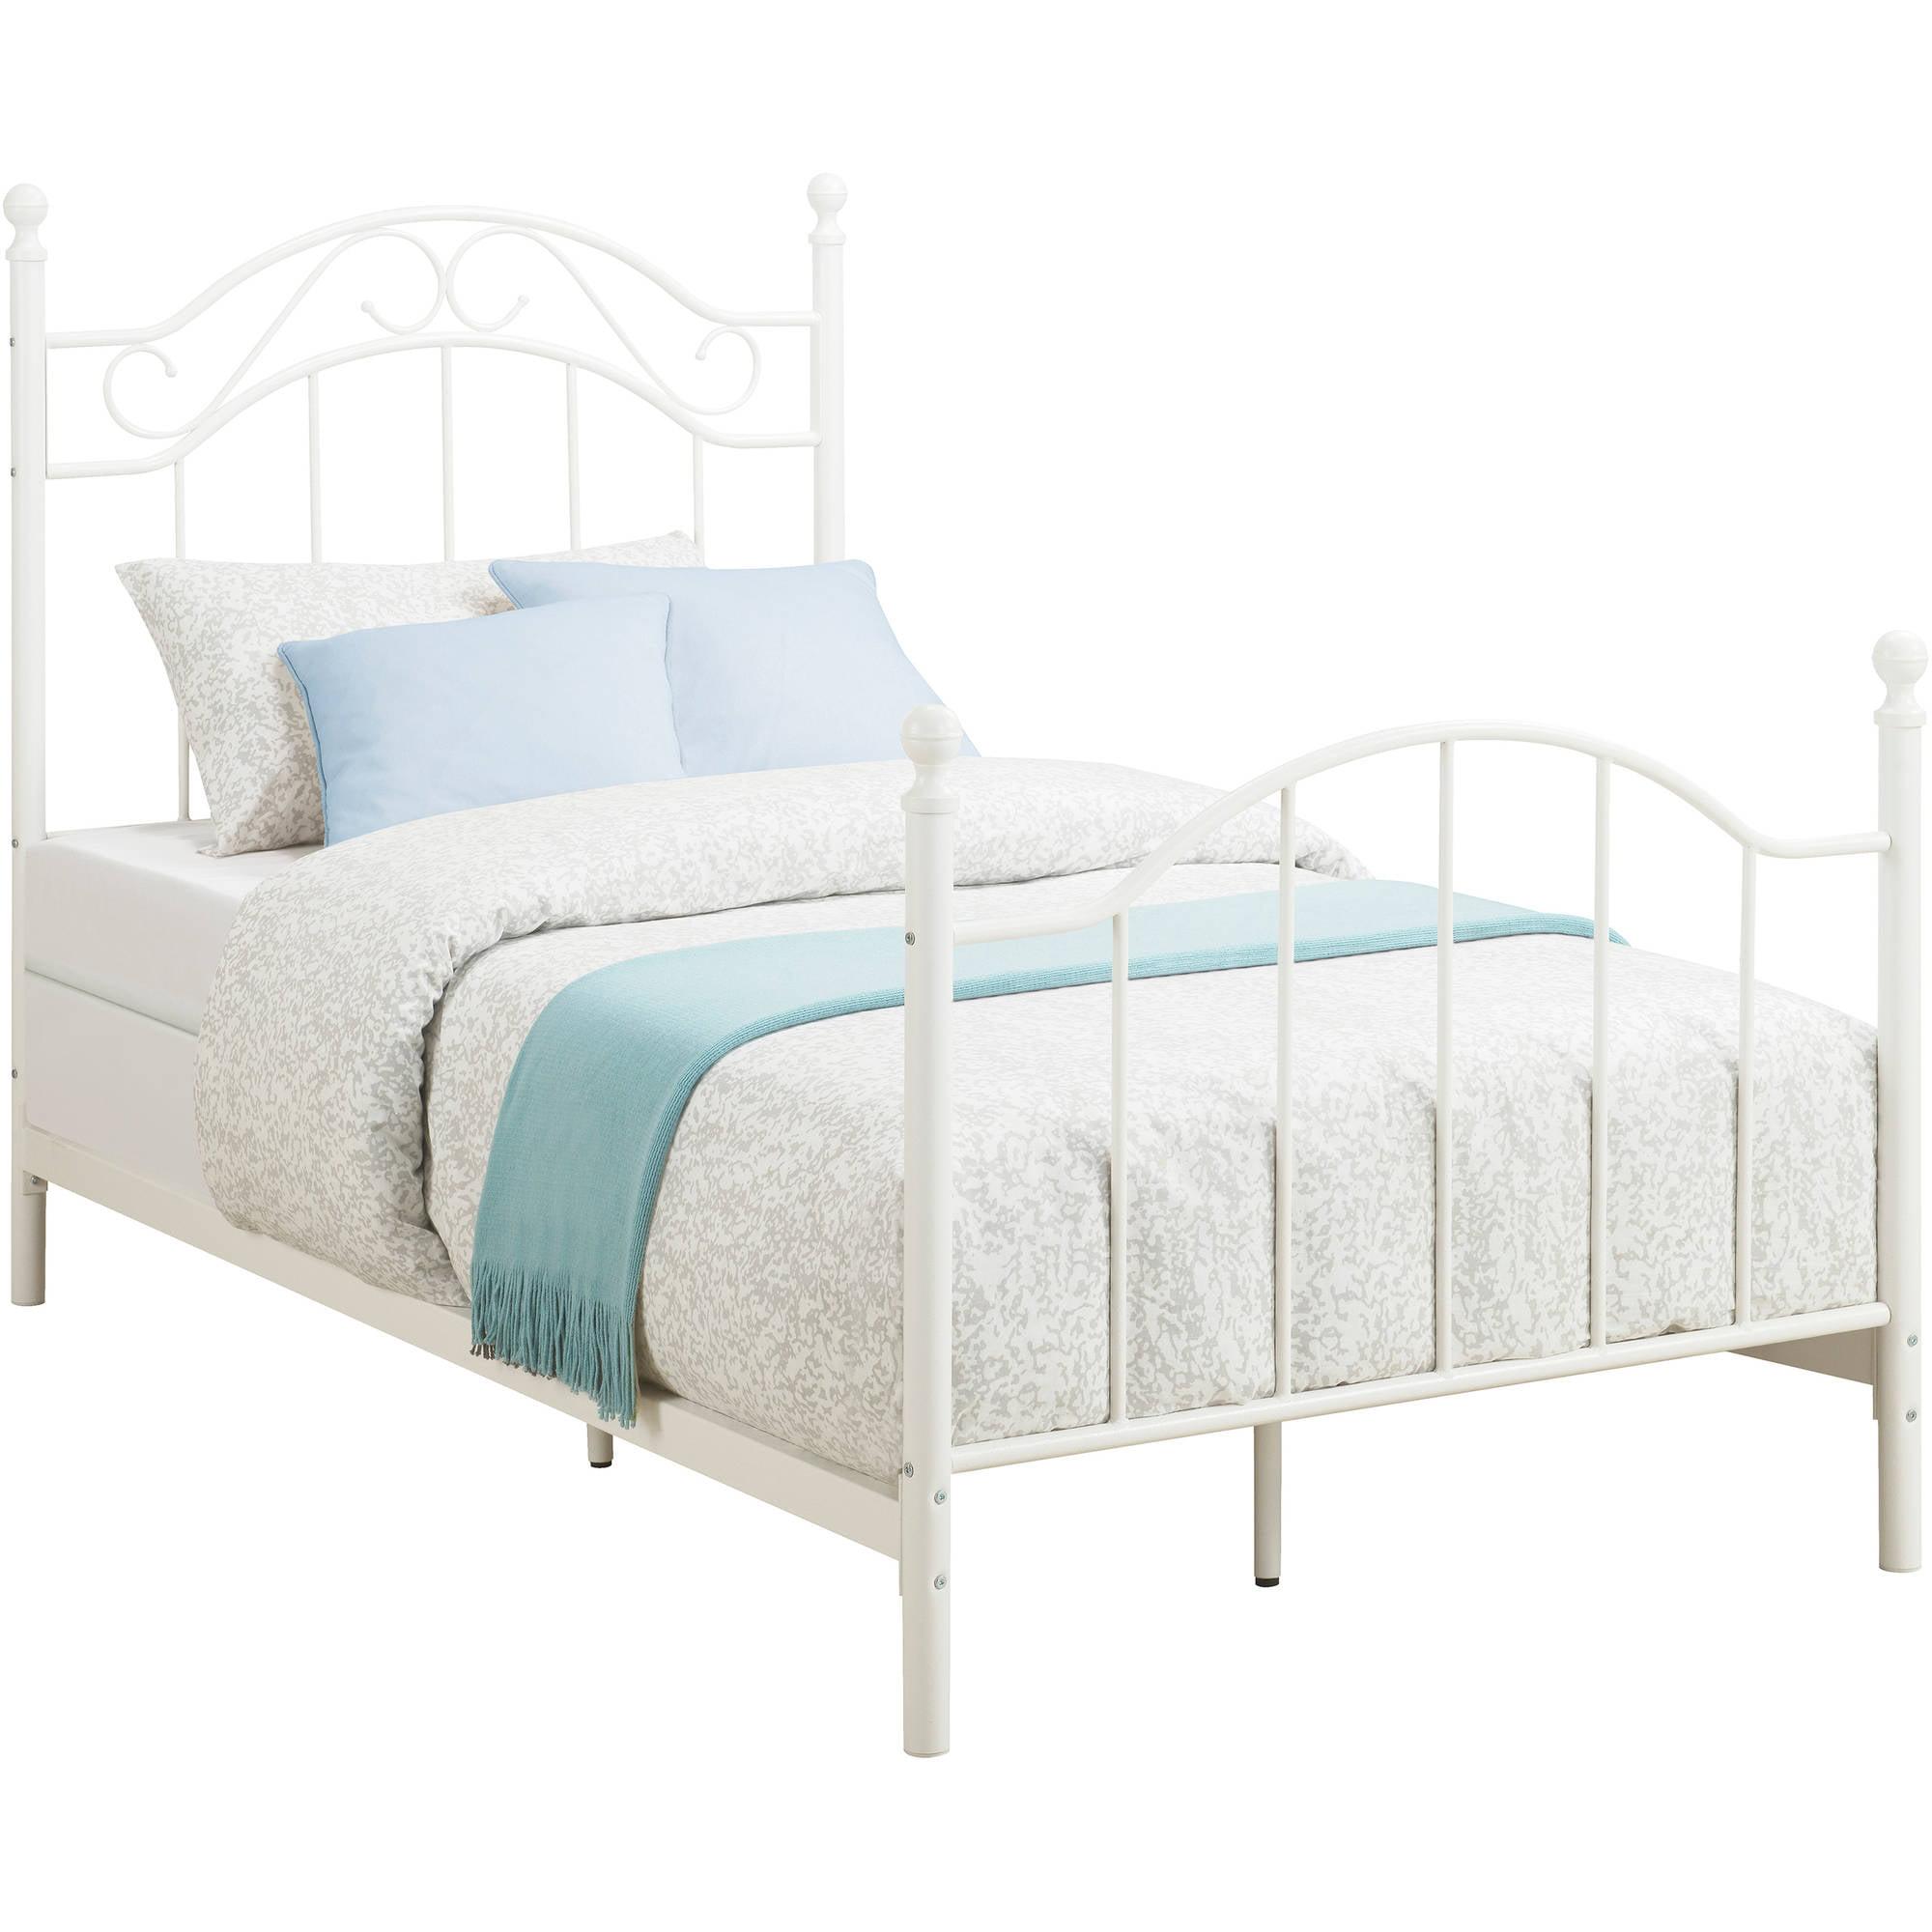 Mainstays Twin Metal Bed - Walmart